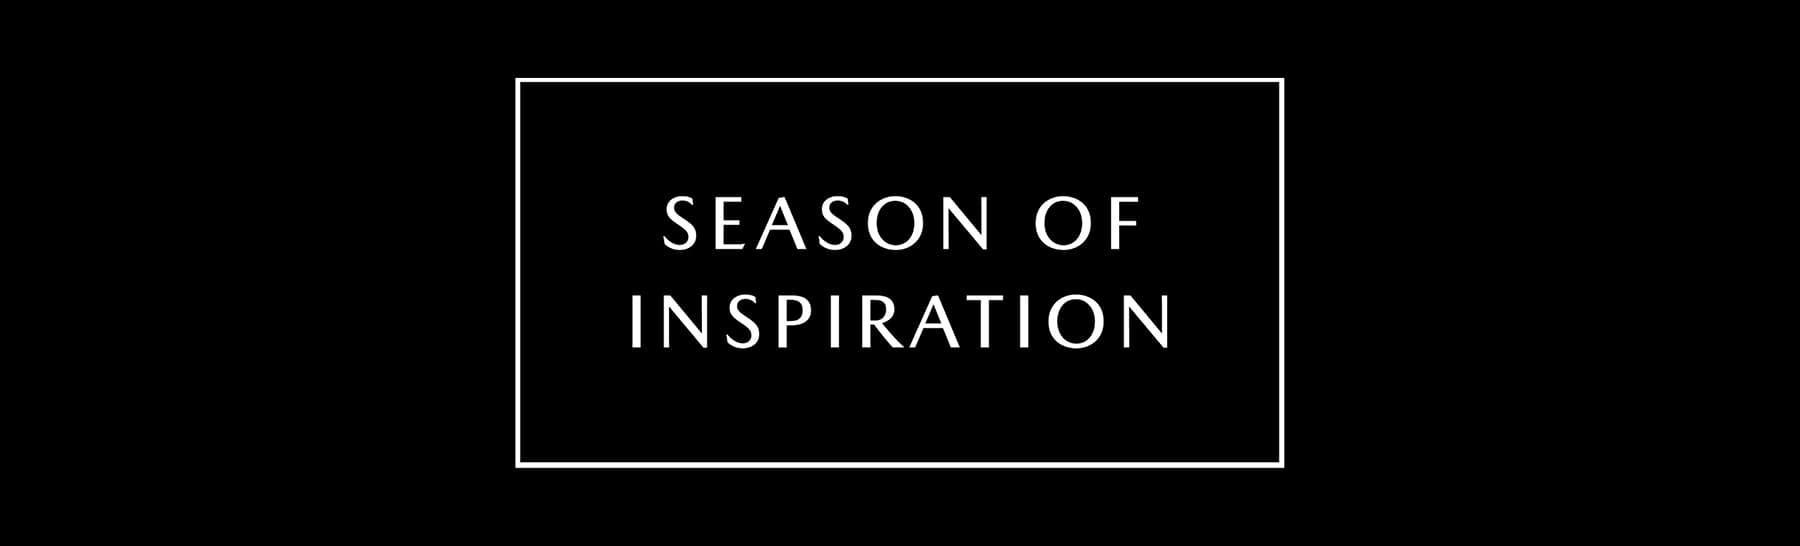 Season of inspiration